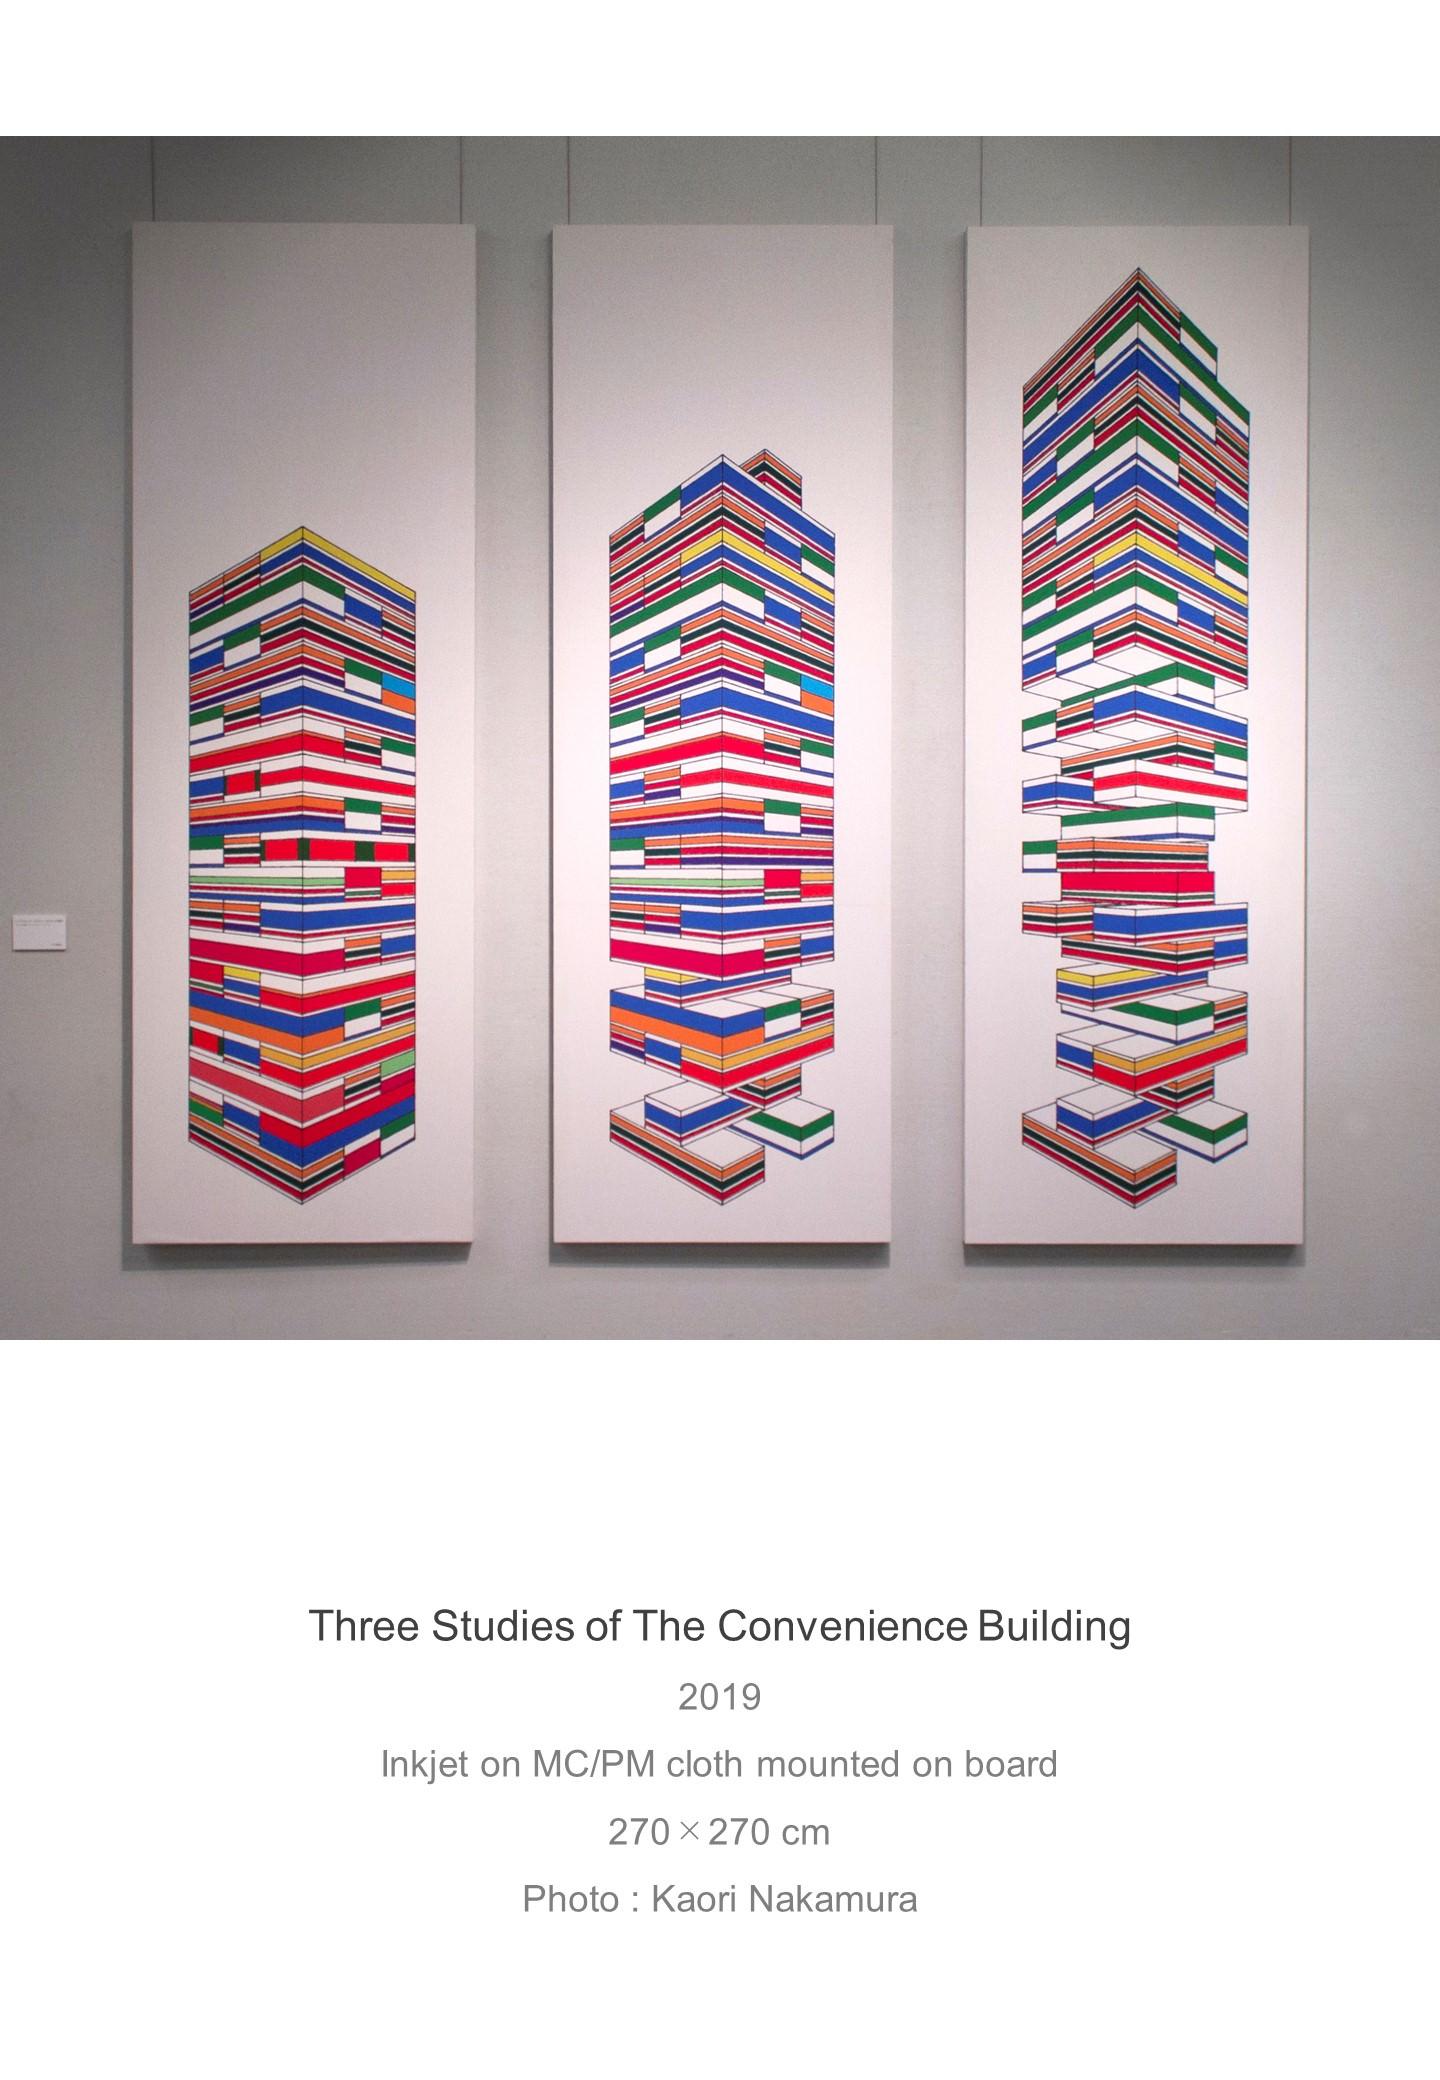 Shota Imai's Artwork of Three Studies of The Convenience Building